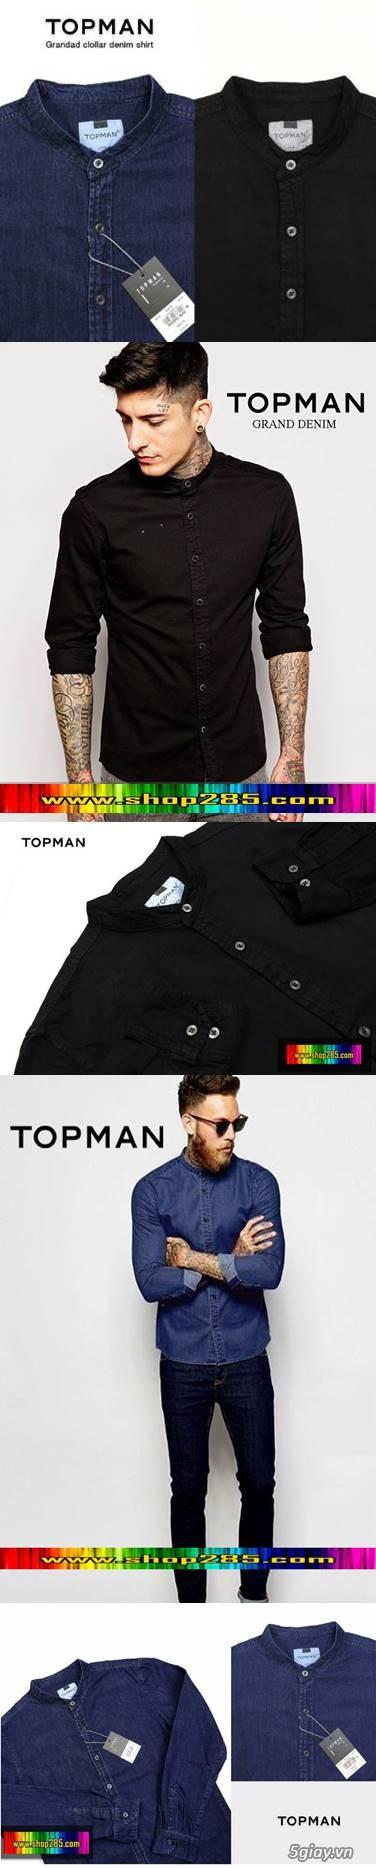 Shop285.com - Shop quần áo : Zara,Jules,Jake*s,,Hollister,Aber,CK,Tommy,Levis - 49